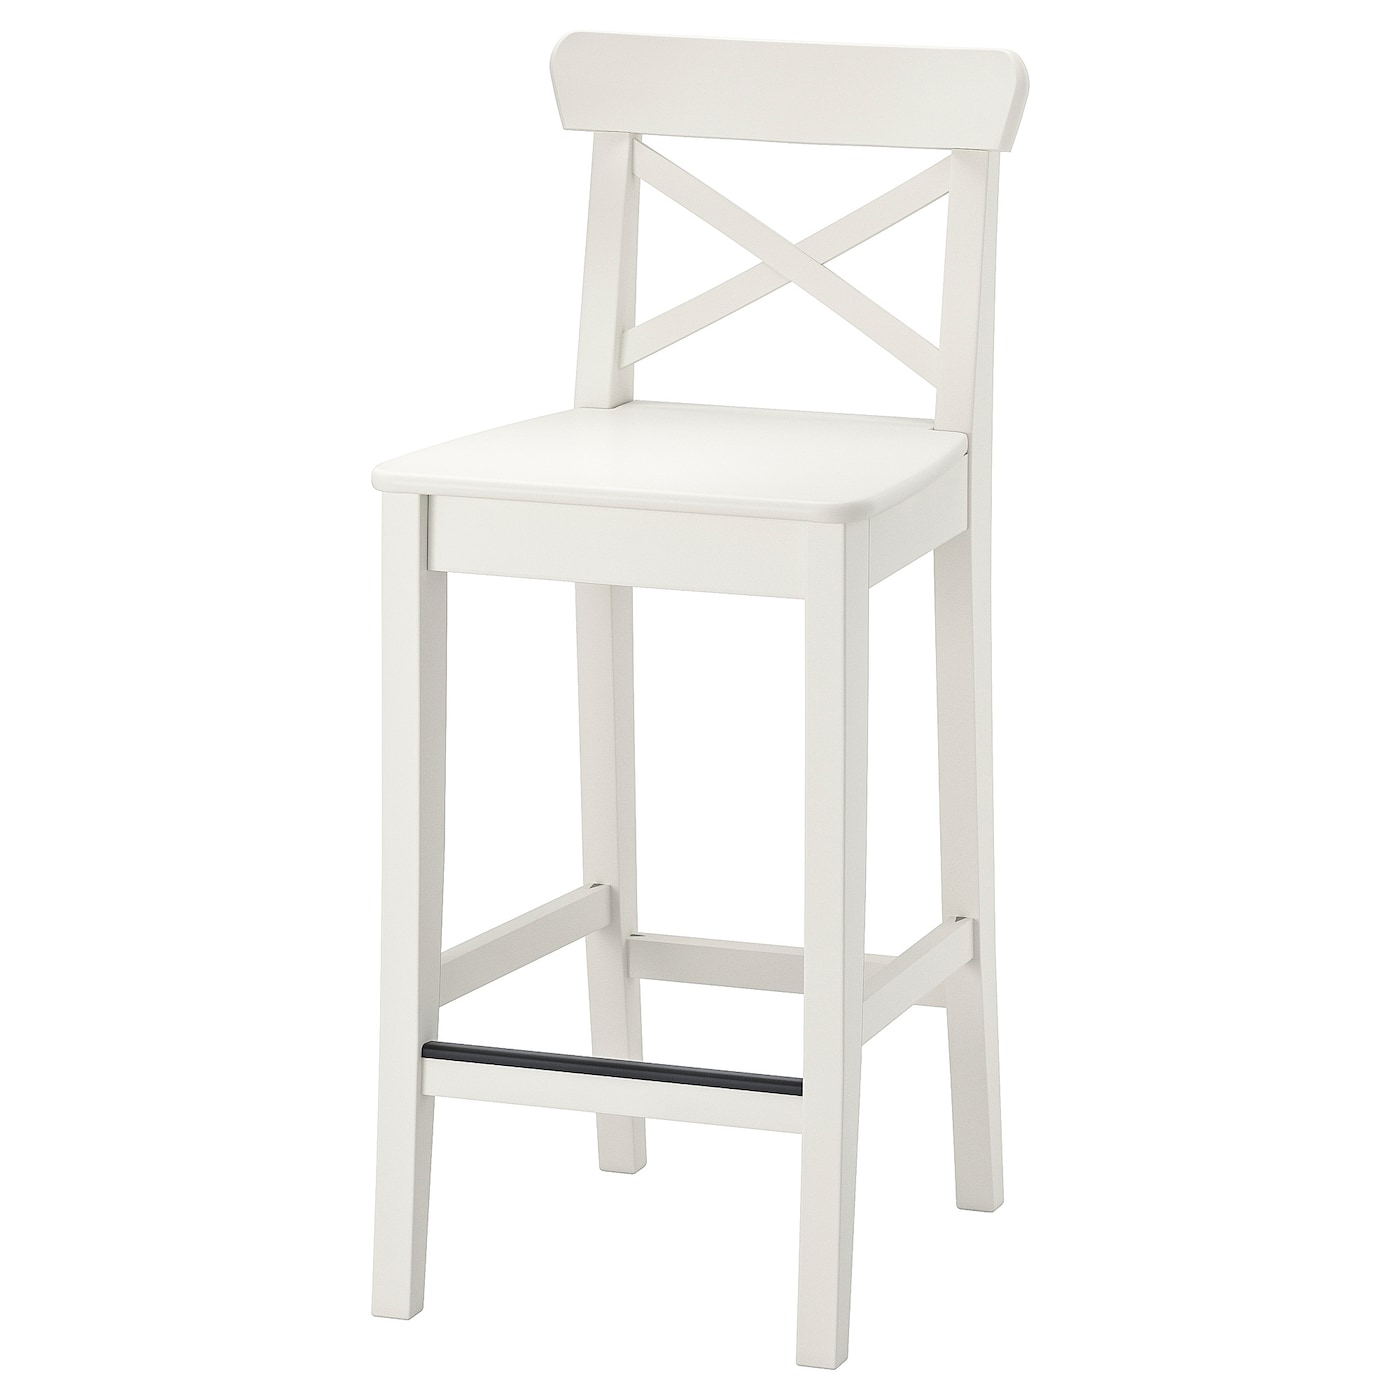 100 Incroyable Concepts Tabouret 4 Pieds Ikea